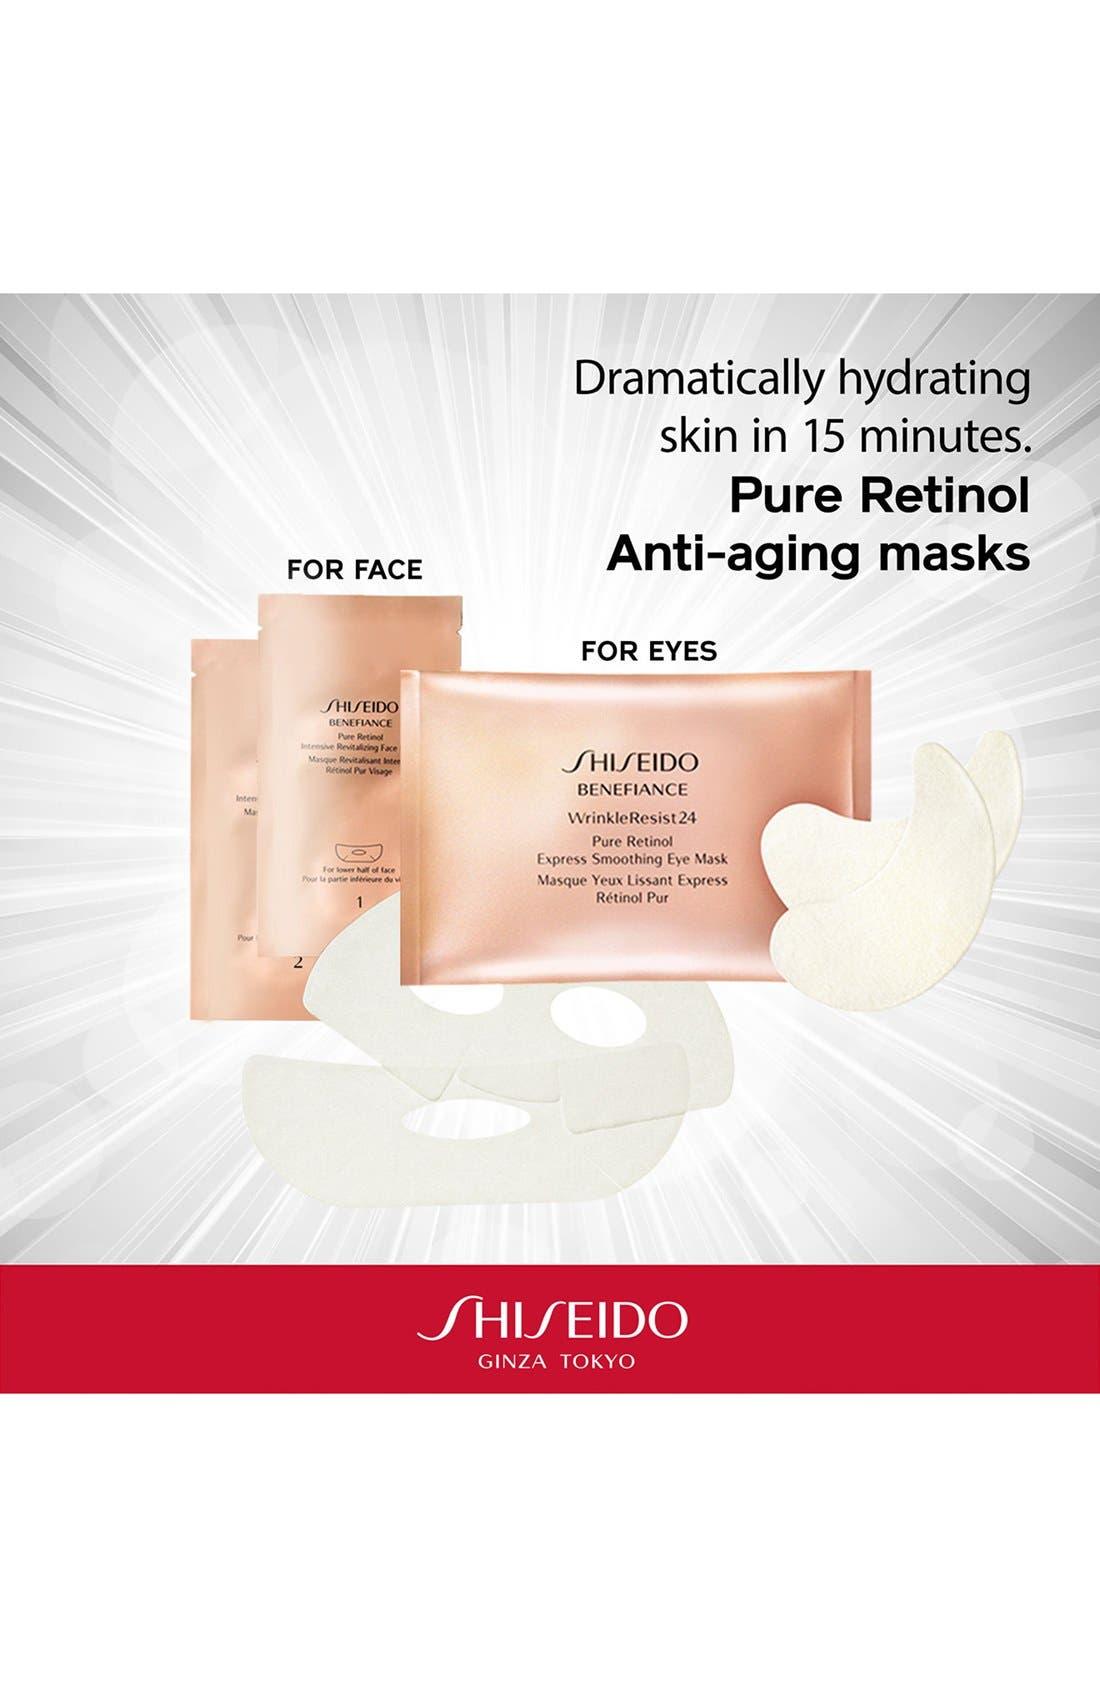 Benefiance WrinkleResist24 Pure Retinol Express Smoothing Eye Mask,                             Alternate thumbnail 6, color,                             NO COLOR